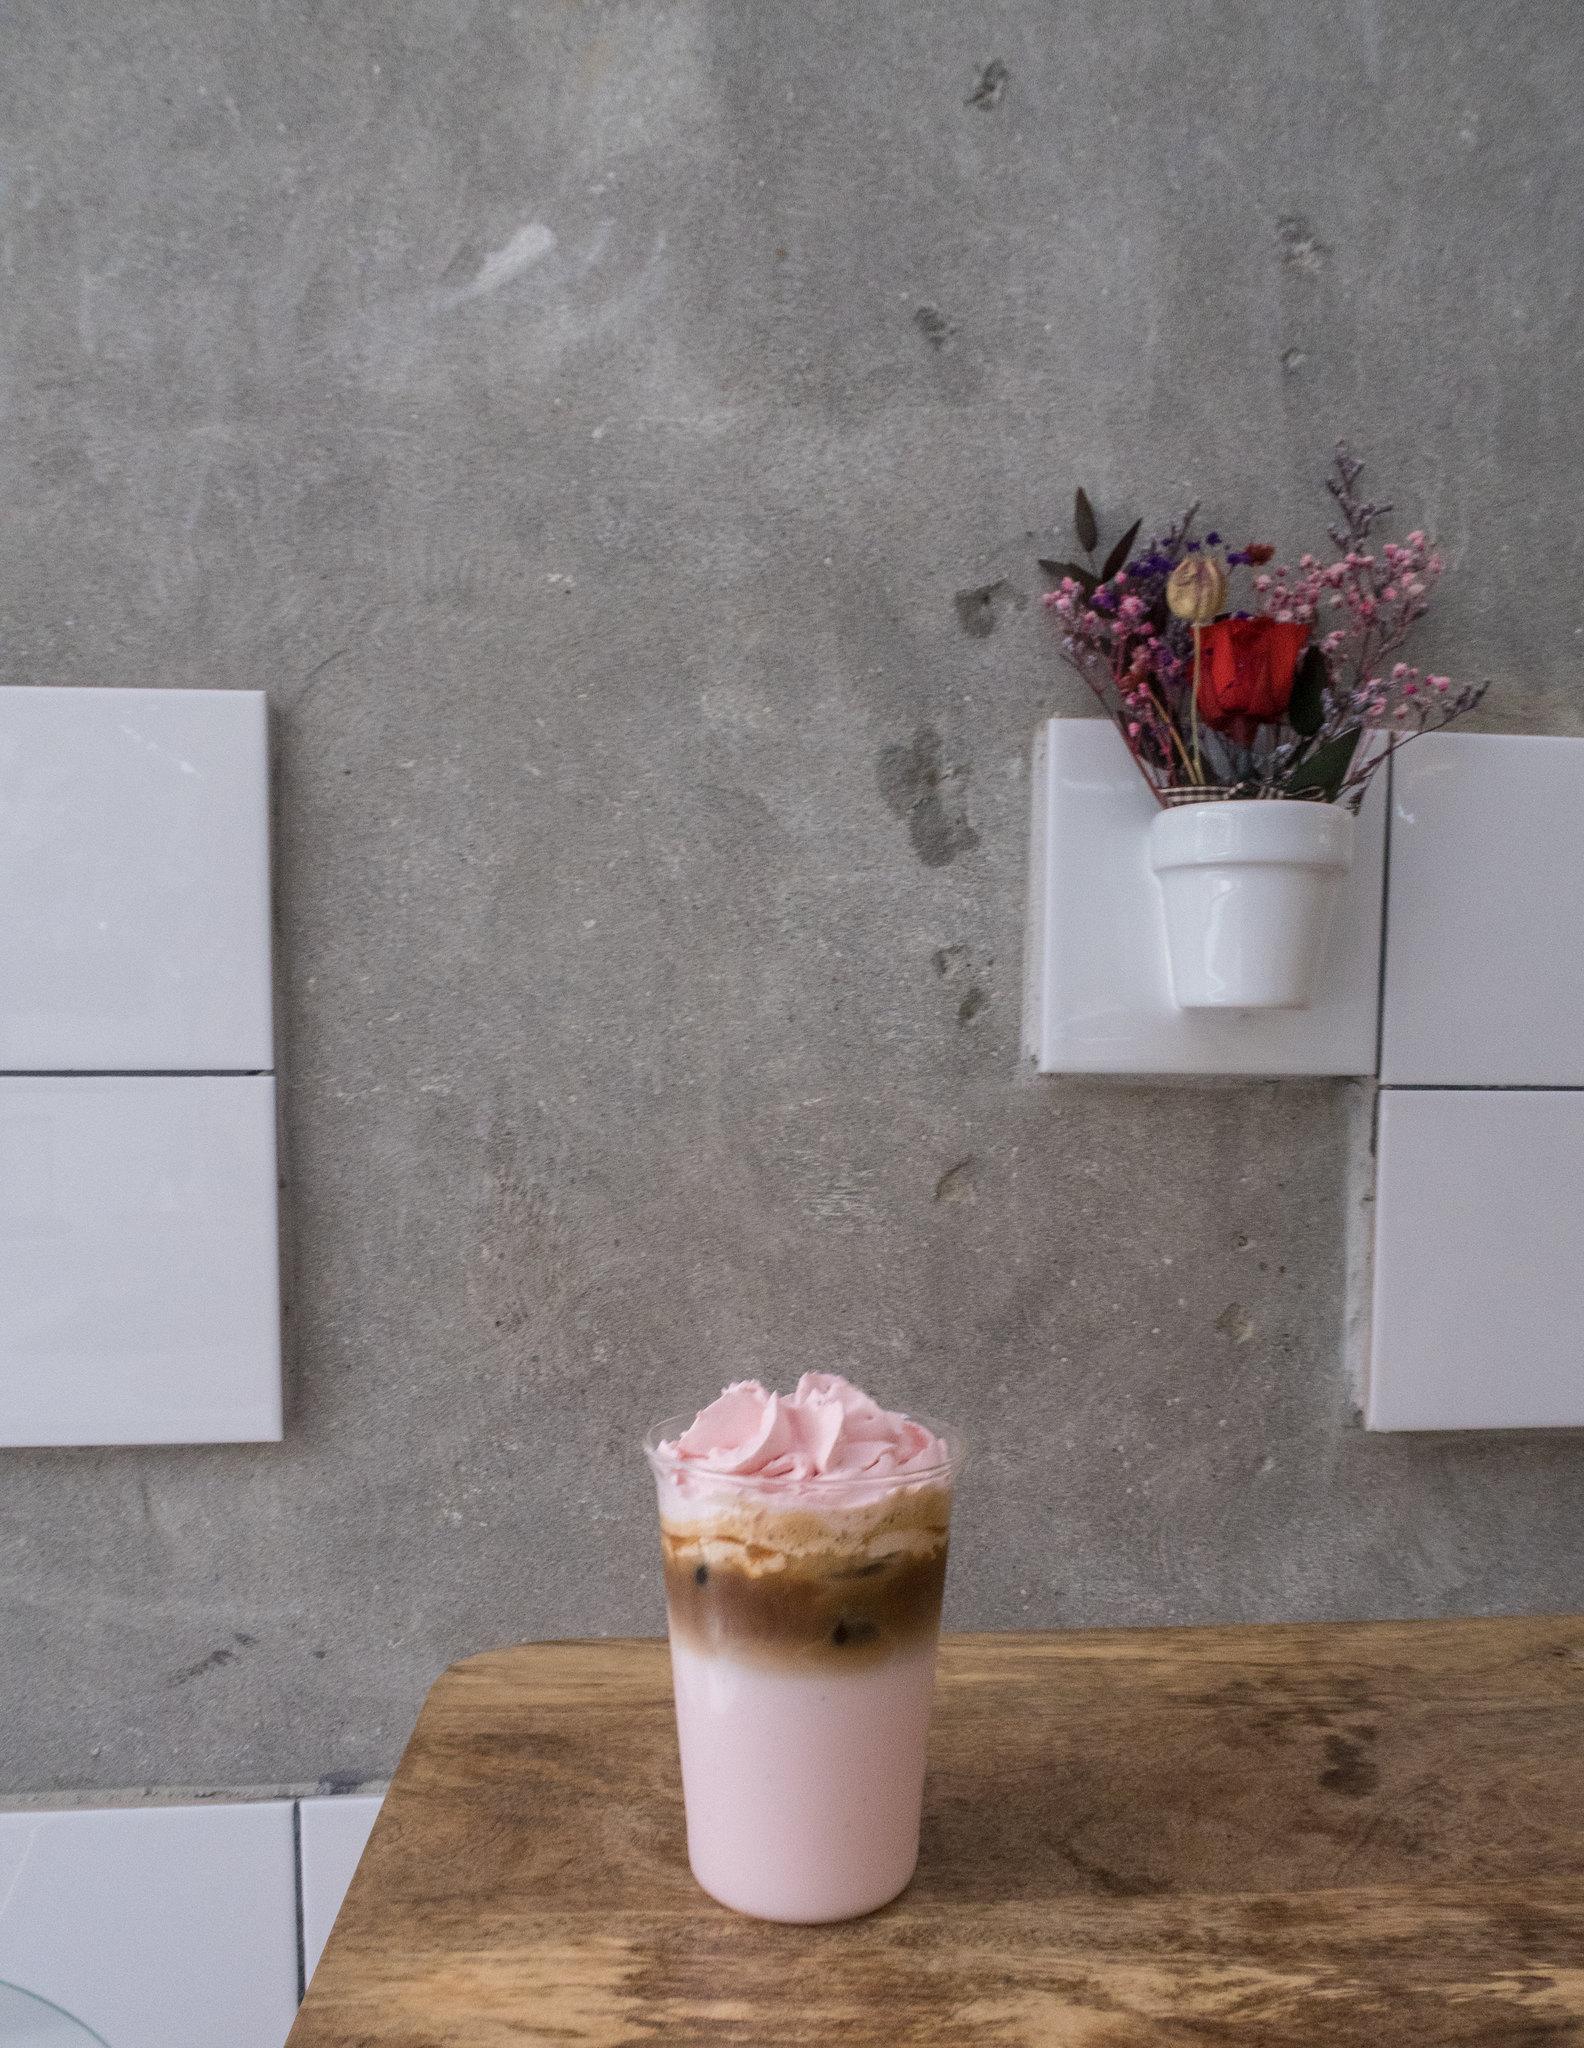 Cafehopping in Seoul